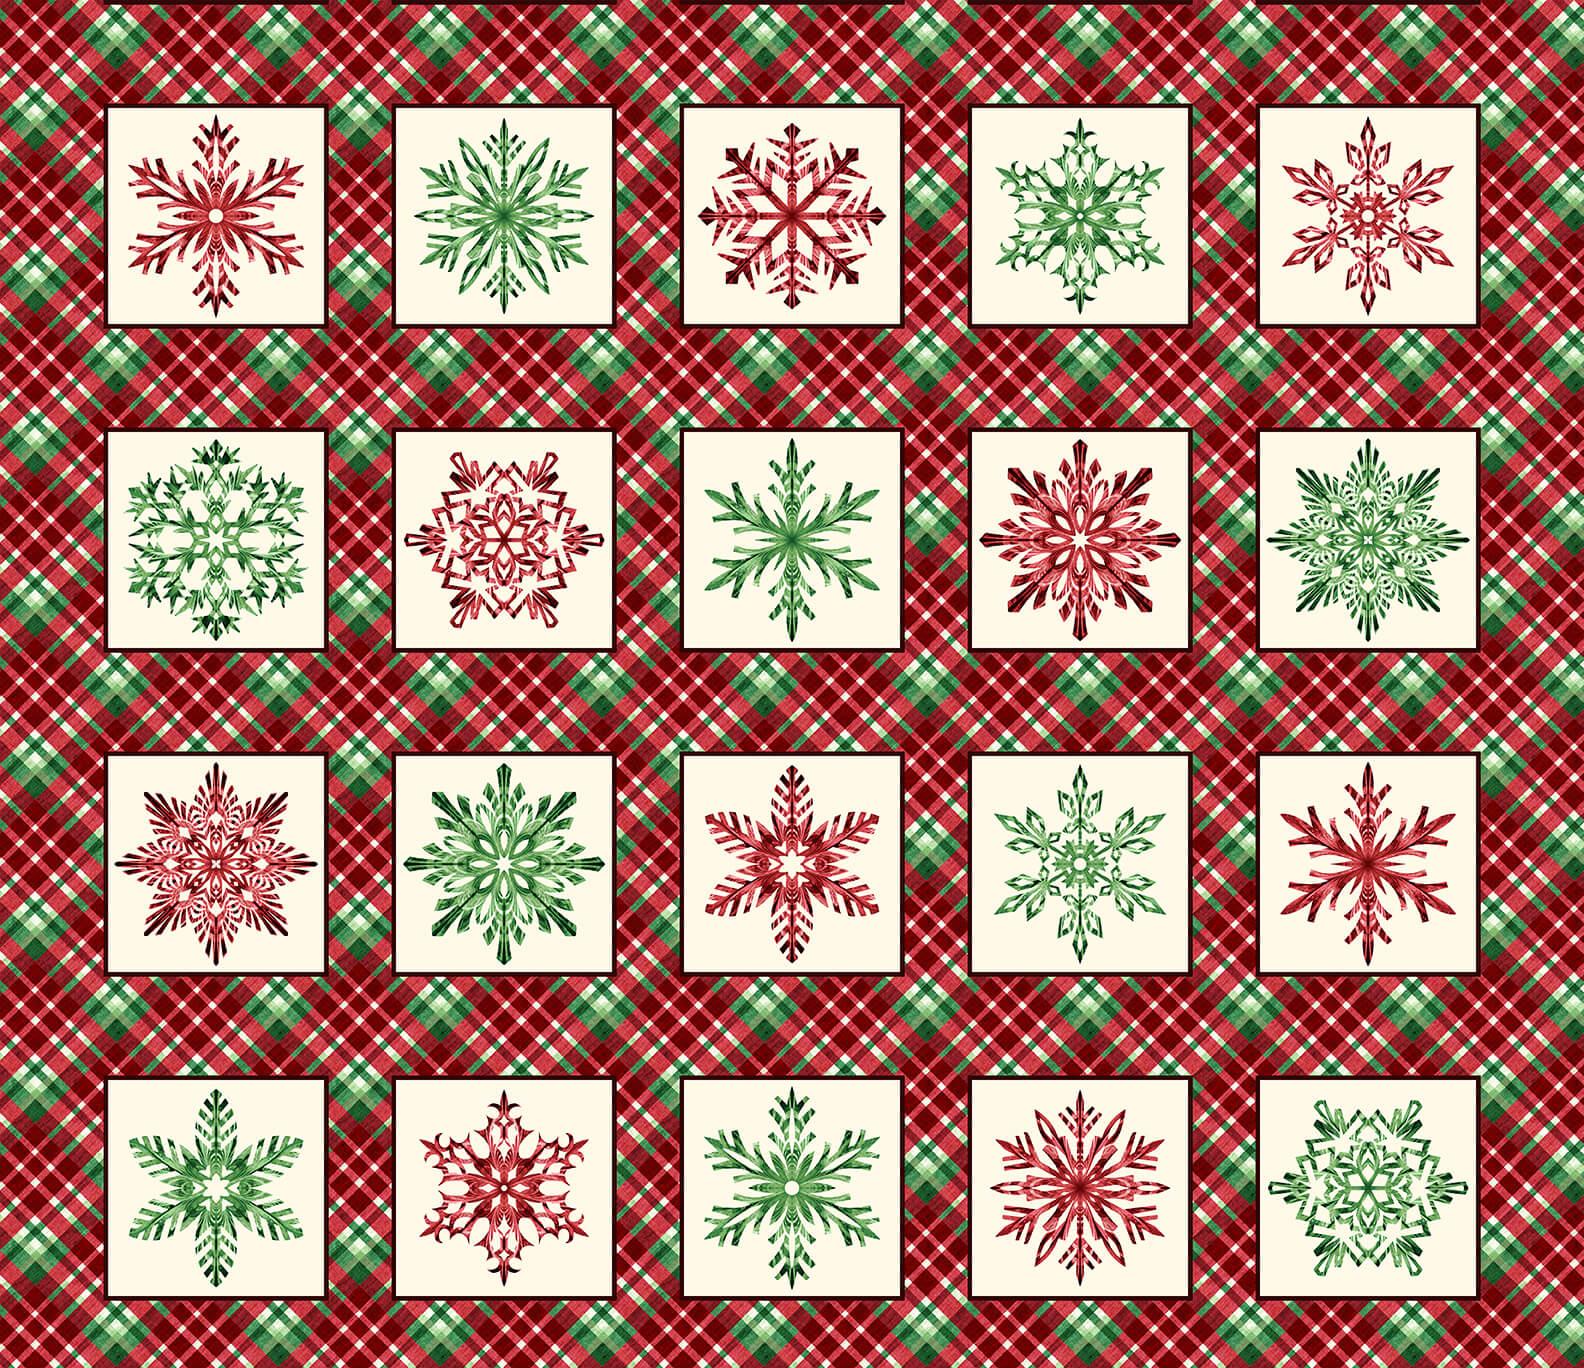 Hometown Holiday Snowflake Blocks Red 1 yard Repeat